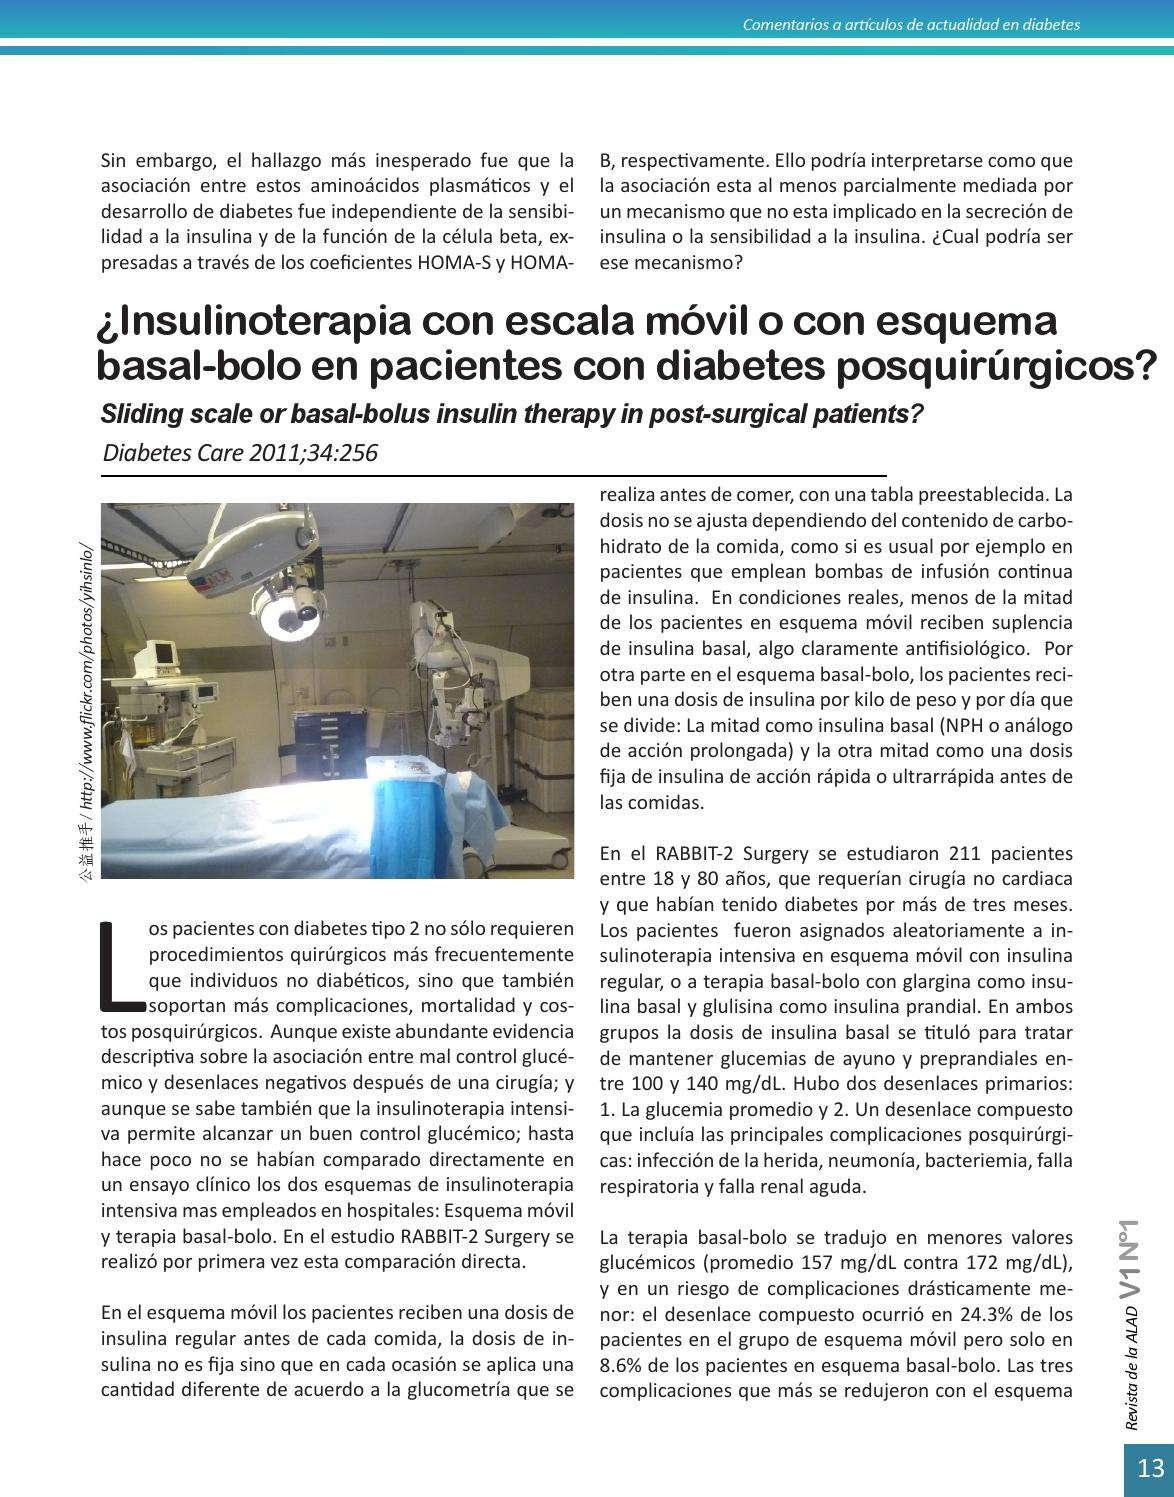 tabla de insulina de escala móvil para diabetes